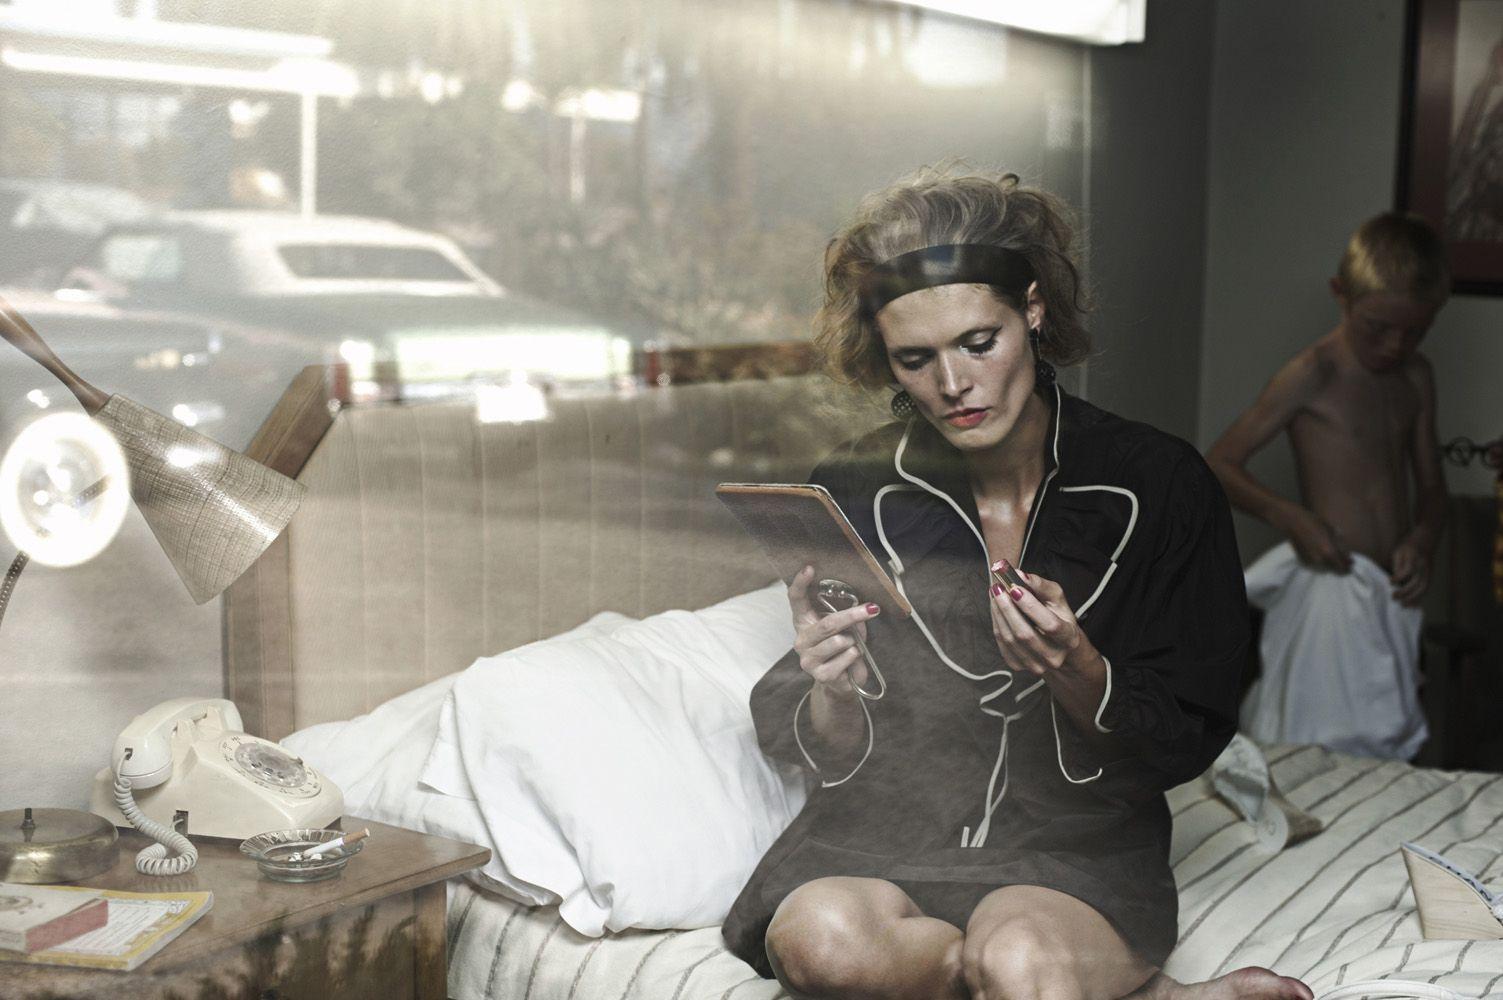 ☆ Malgosia Bela | Photography by Peter Lindbergh | For Vogue Magazine Italy | December 2008 ☆ #Malgosia_Bela #Peter_Lindbergh #Vogue #2008